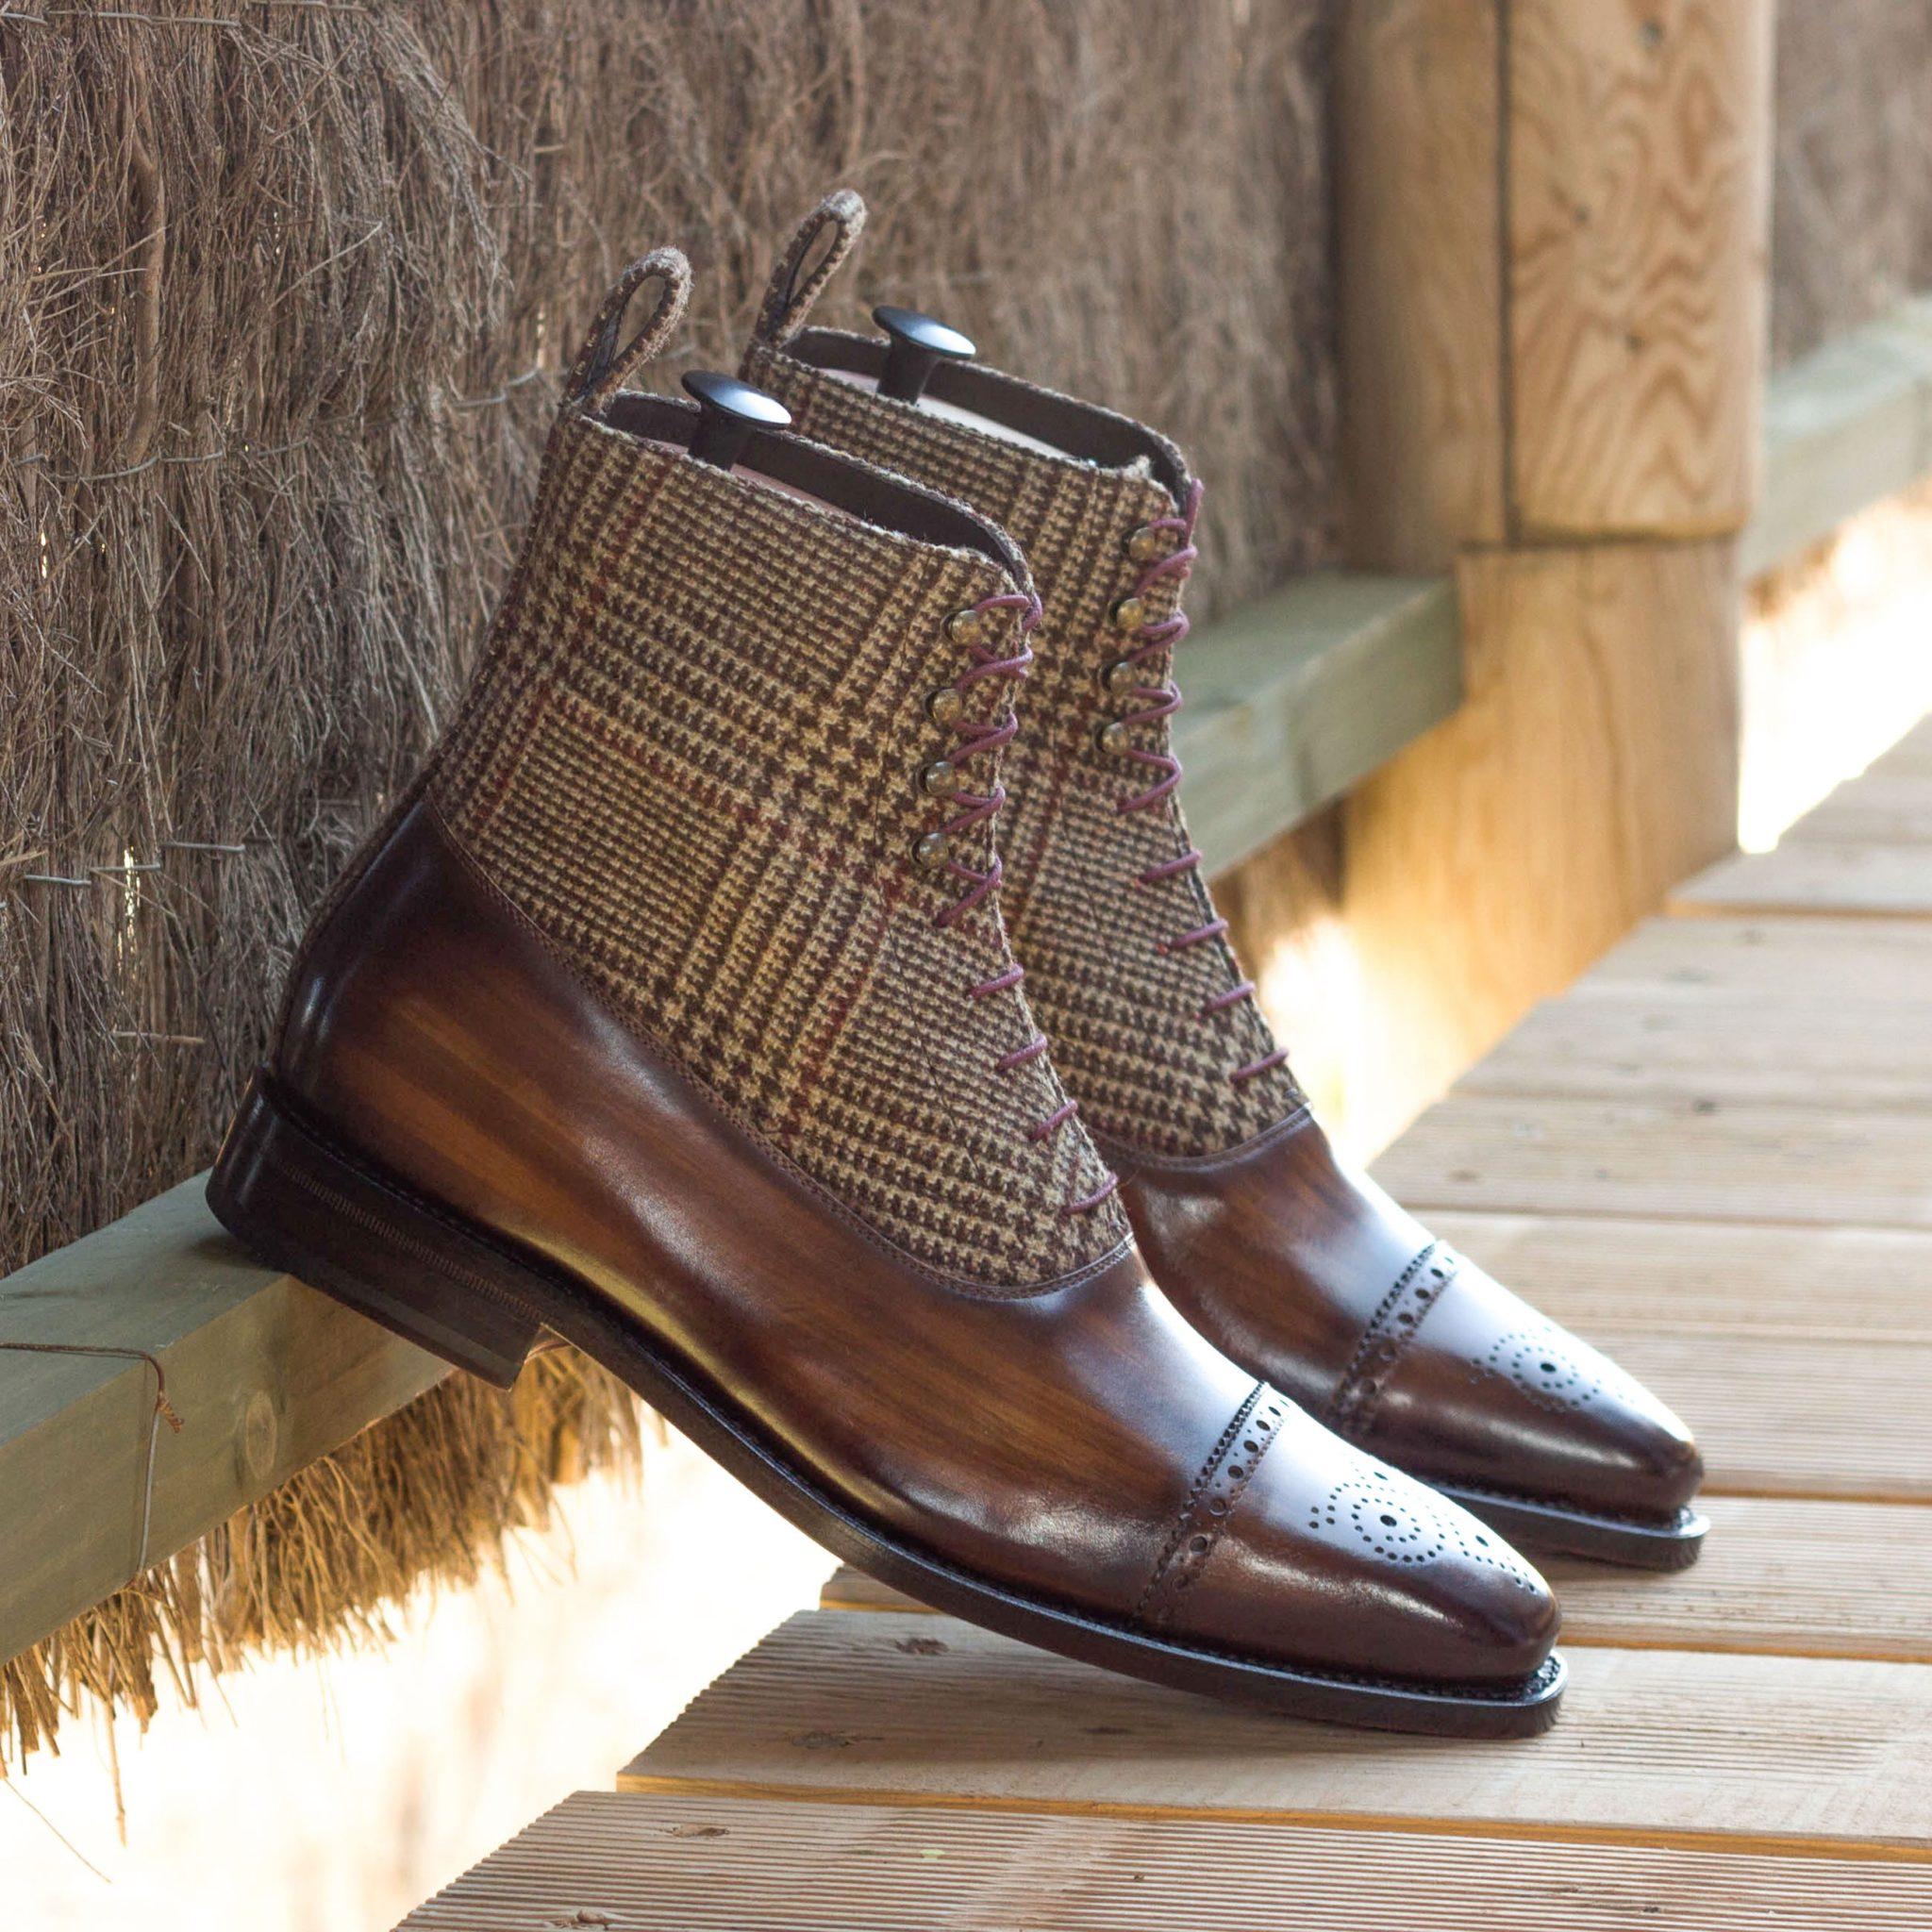 Balmoral Boot by Josh M.